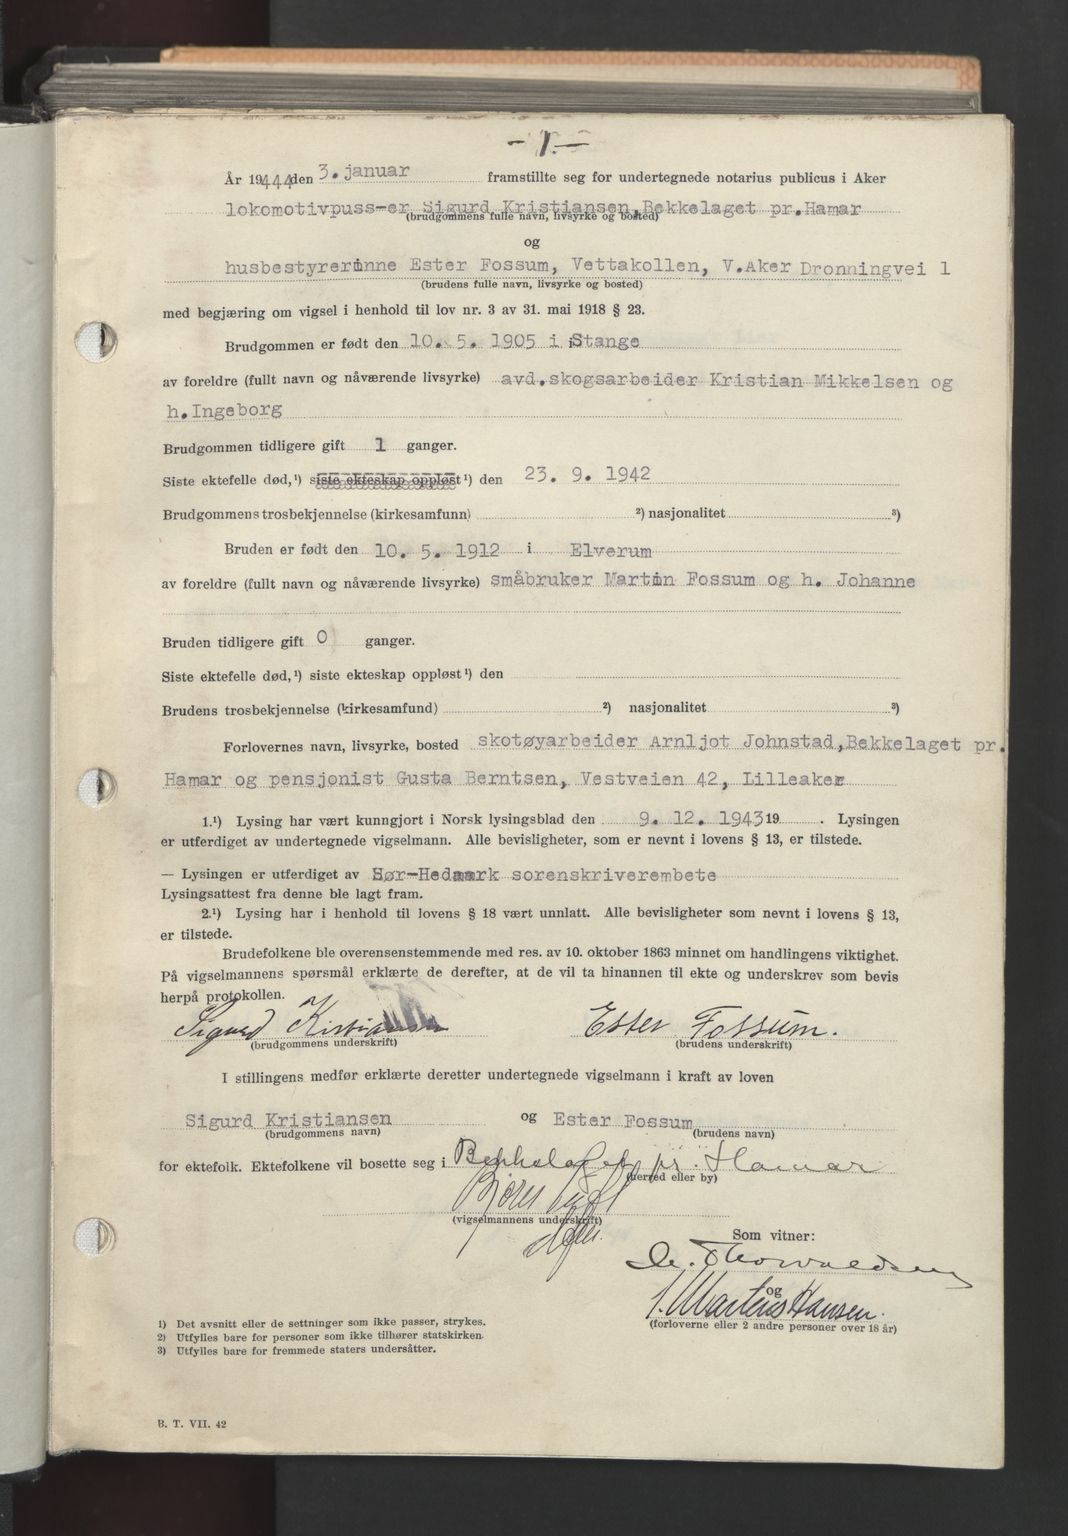 SAO, Aker sorenskriveri, L/Lc/Lcb/L0021: Vigselprotokoll, 1944, s. 1